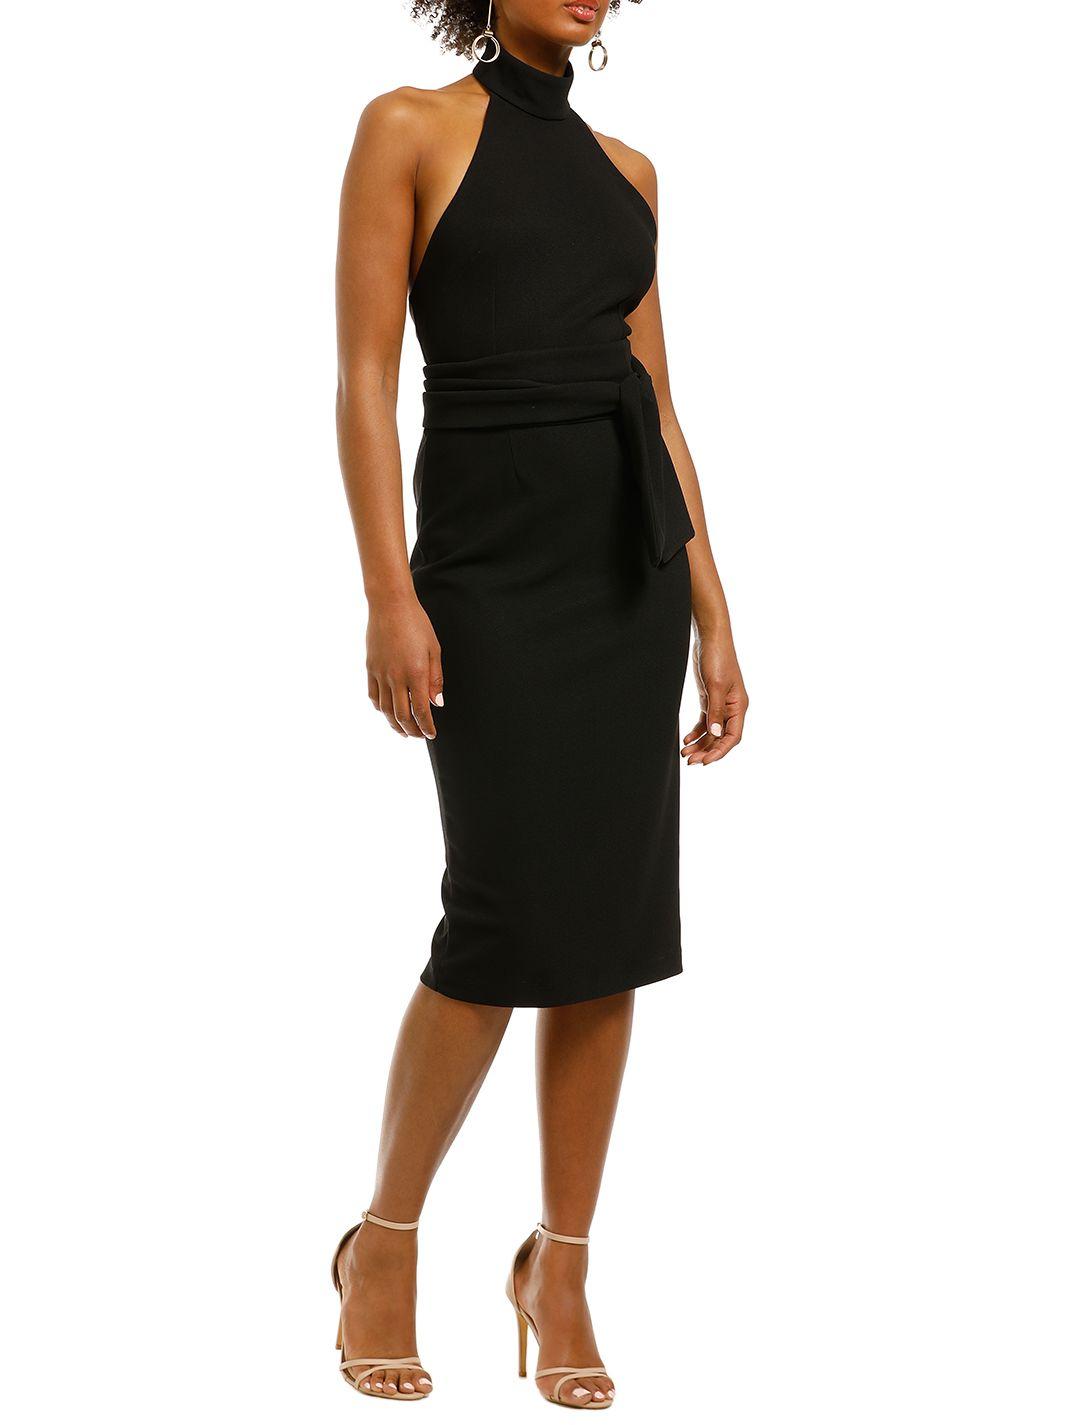 Pasduchas-Aurelia-High-Midi-Dress-Black-Side